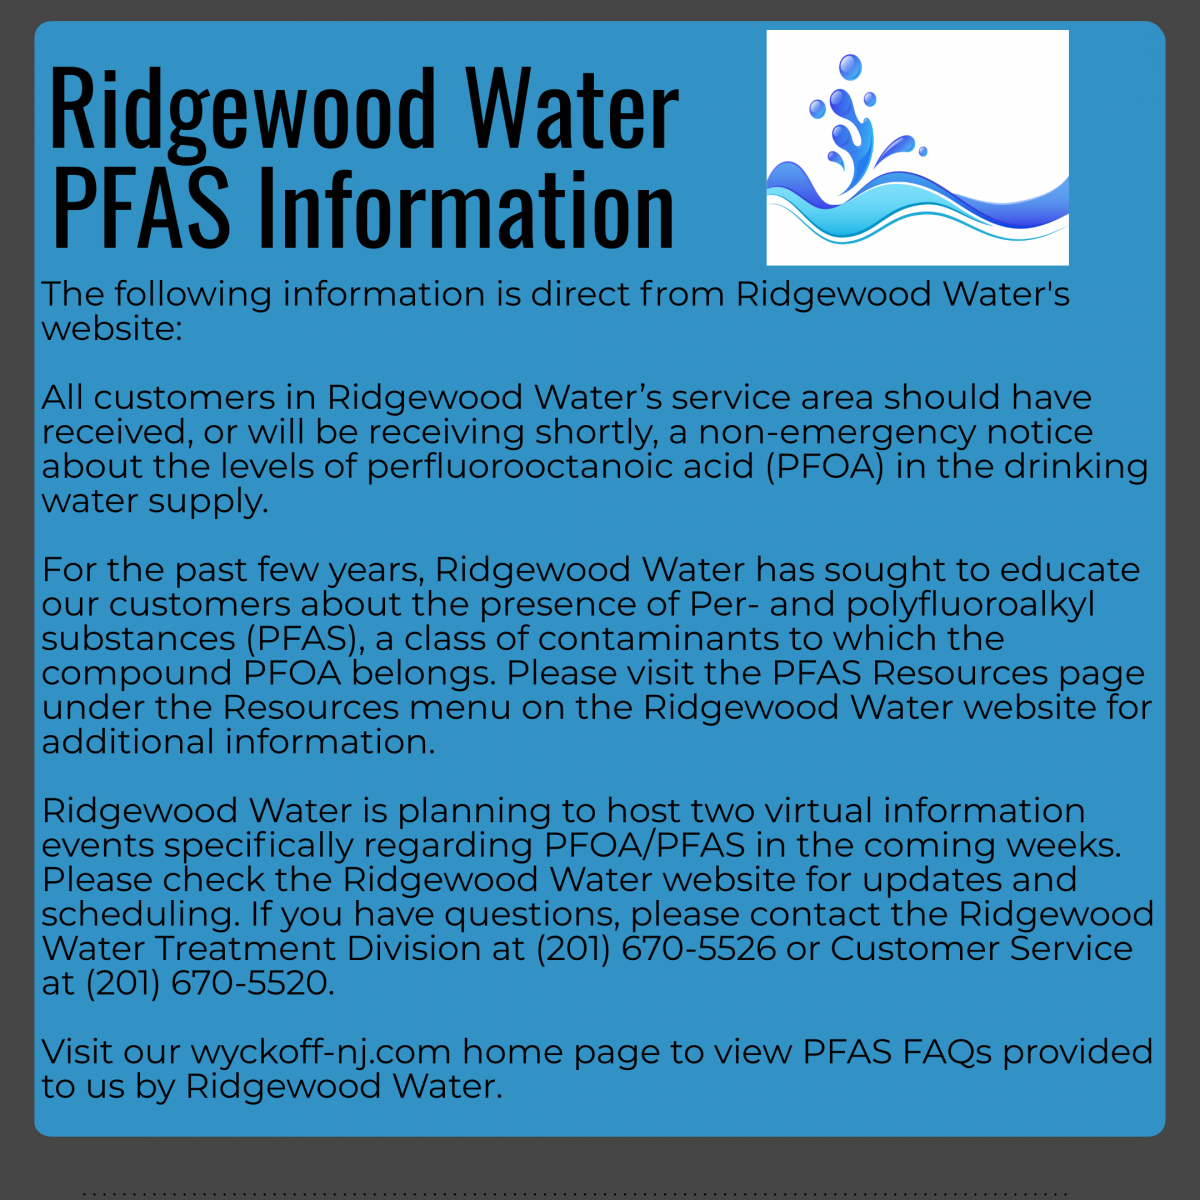 Ridgewood Water